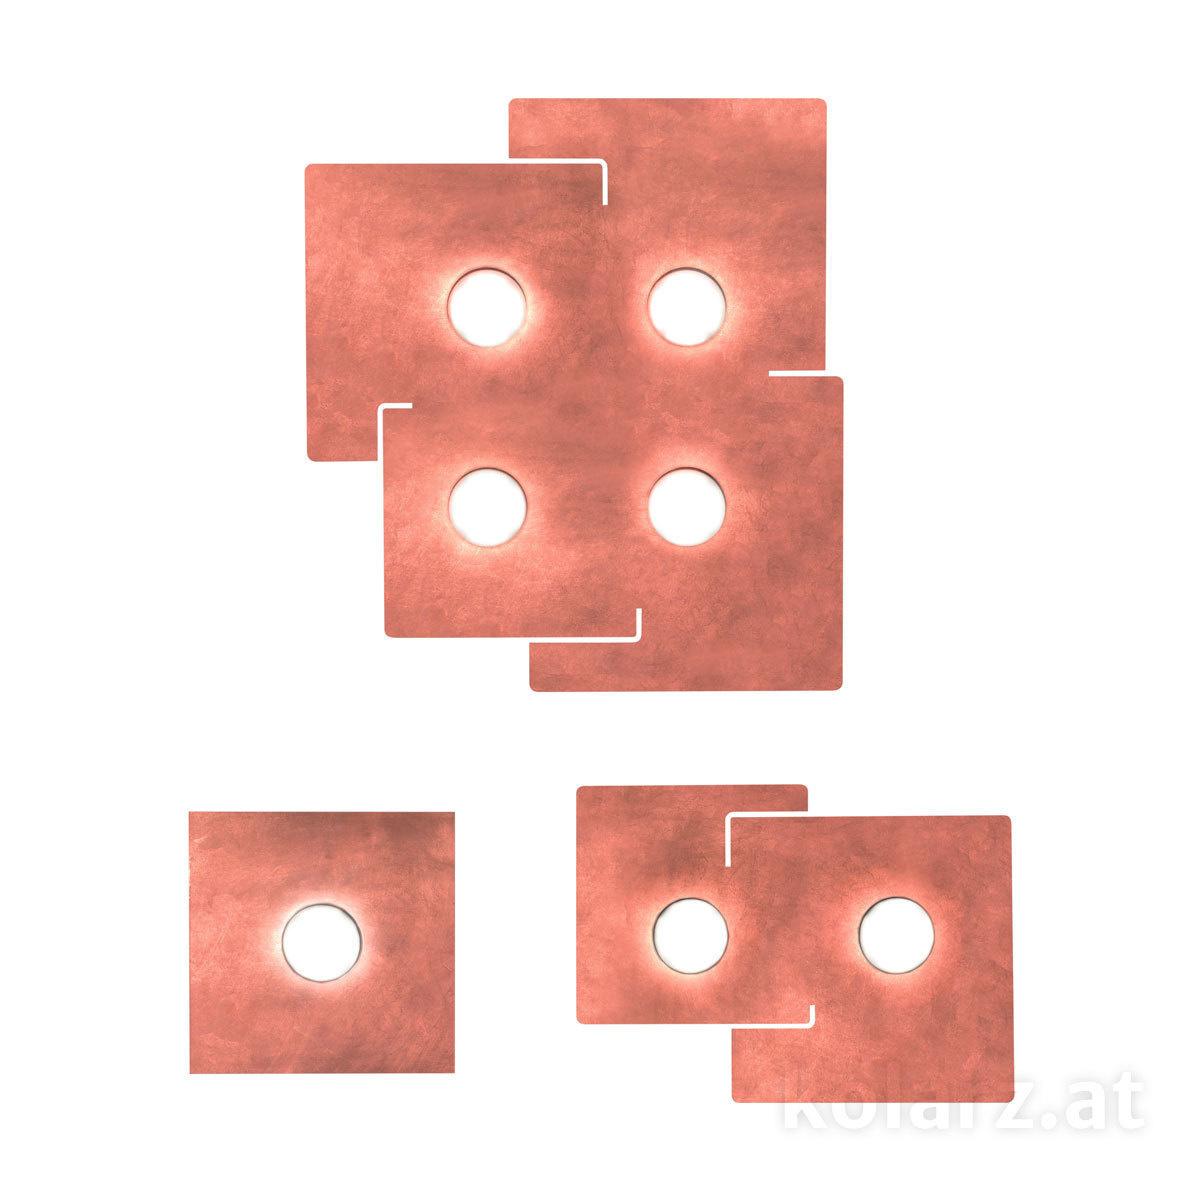 A1337-14-1-Cu-f2.jpg